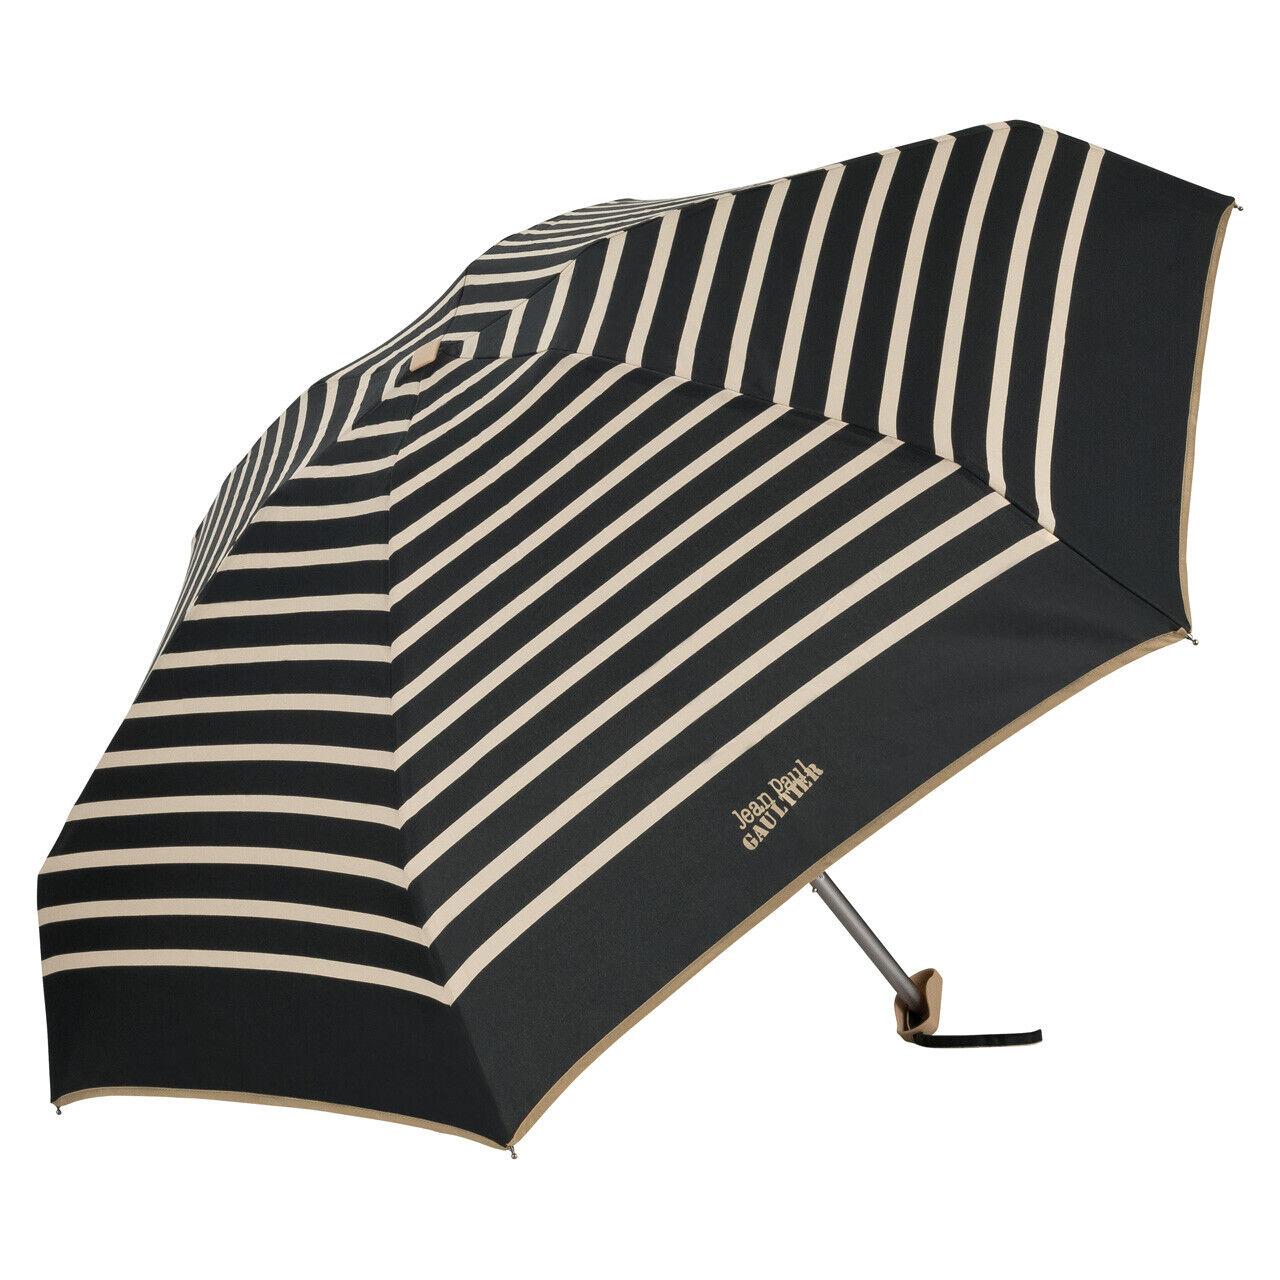 Jean Paul Gaultier Mini Umbrella Dark Navy with Beige Stripes Matching Carrybag